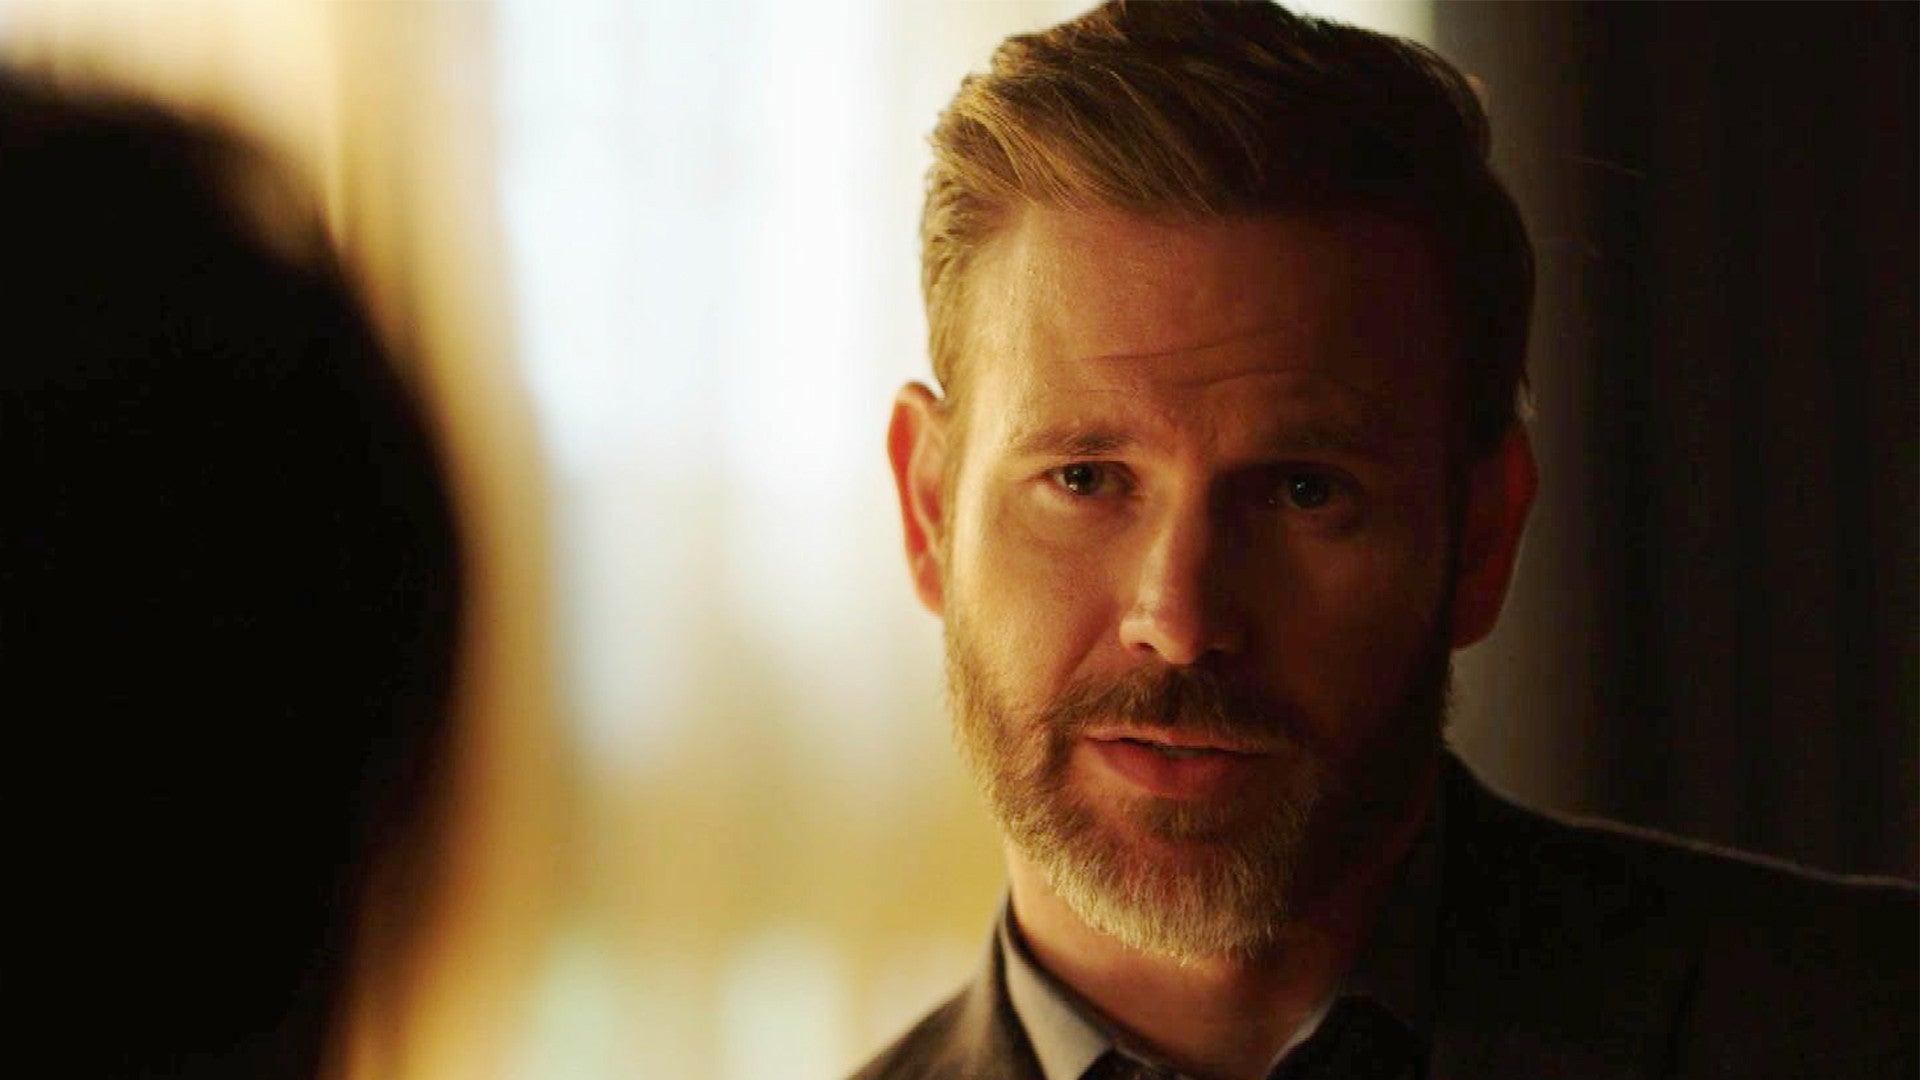 Legacies Sneak Peek Alaric Gives Sebastian A Stern Warning About Pursuing Lizzie Entertainment Tonight